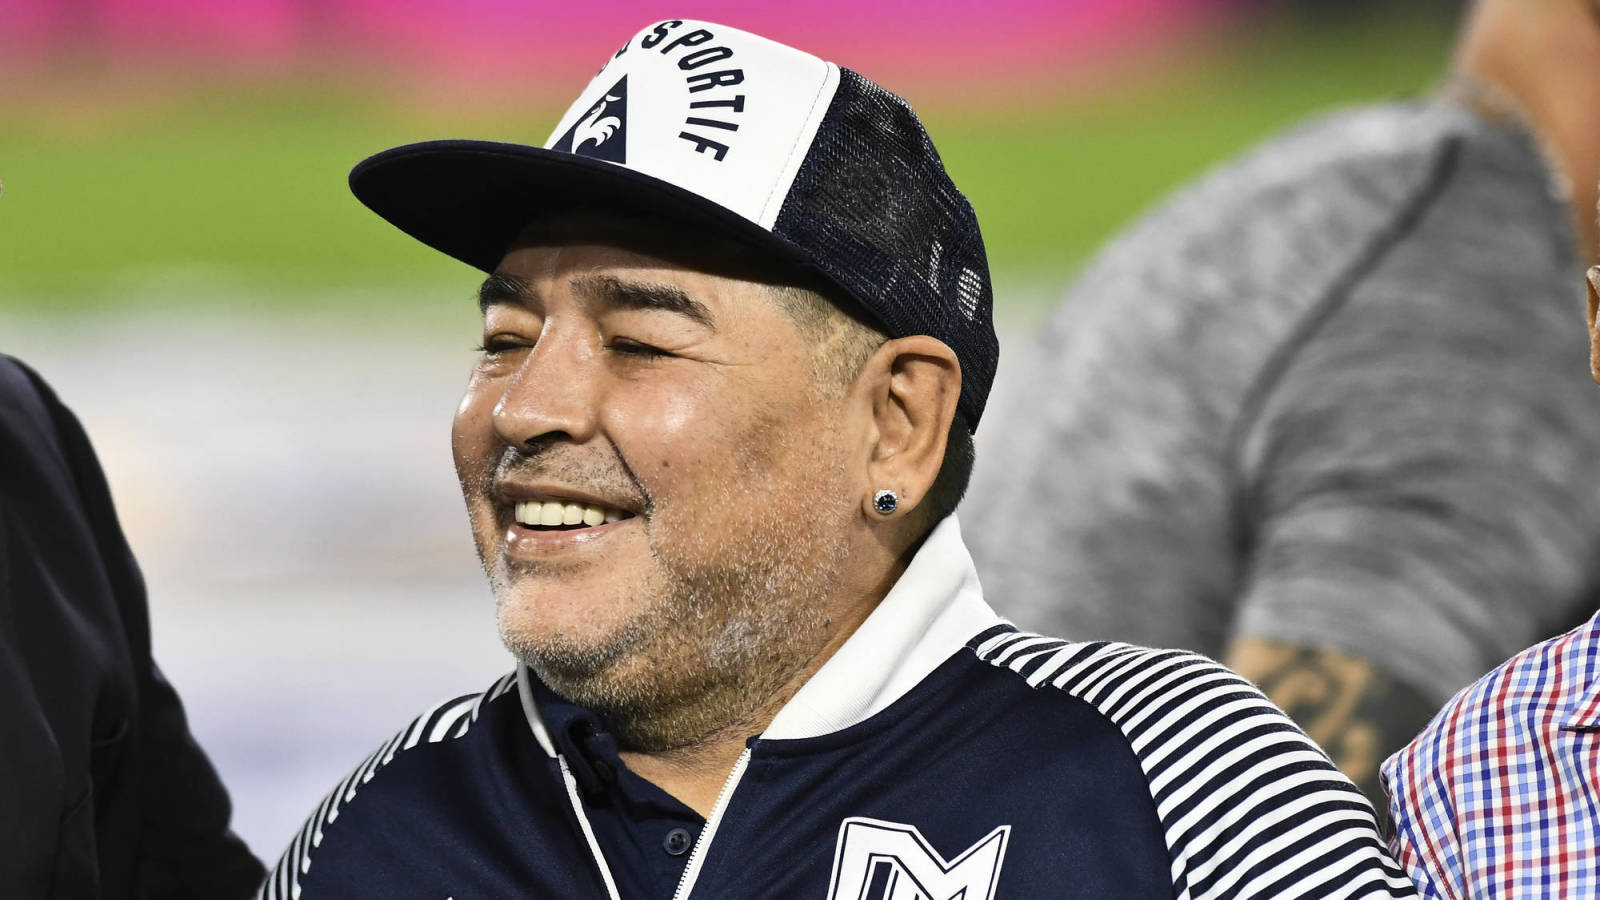 Argentina soccer legend Diego Maradona dead at 60